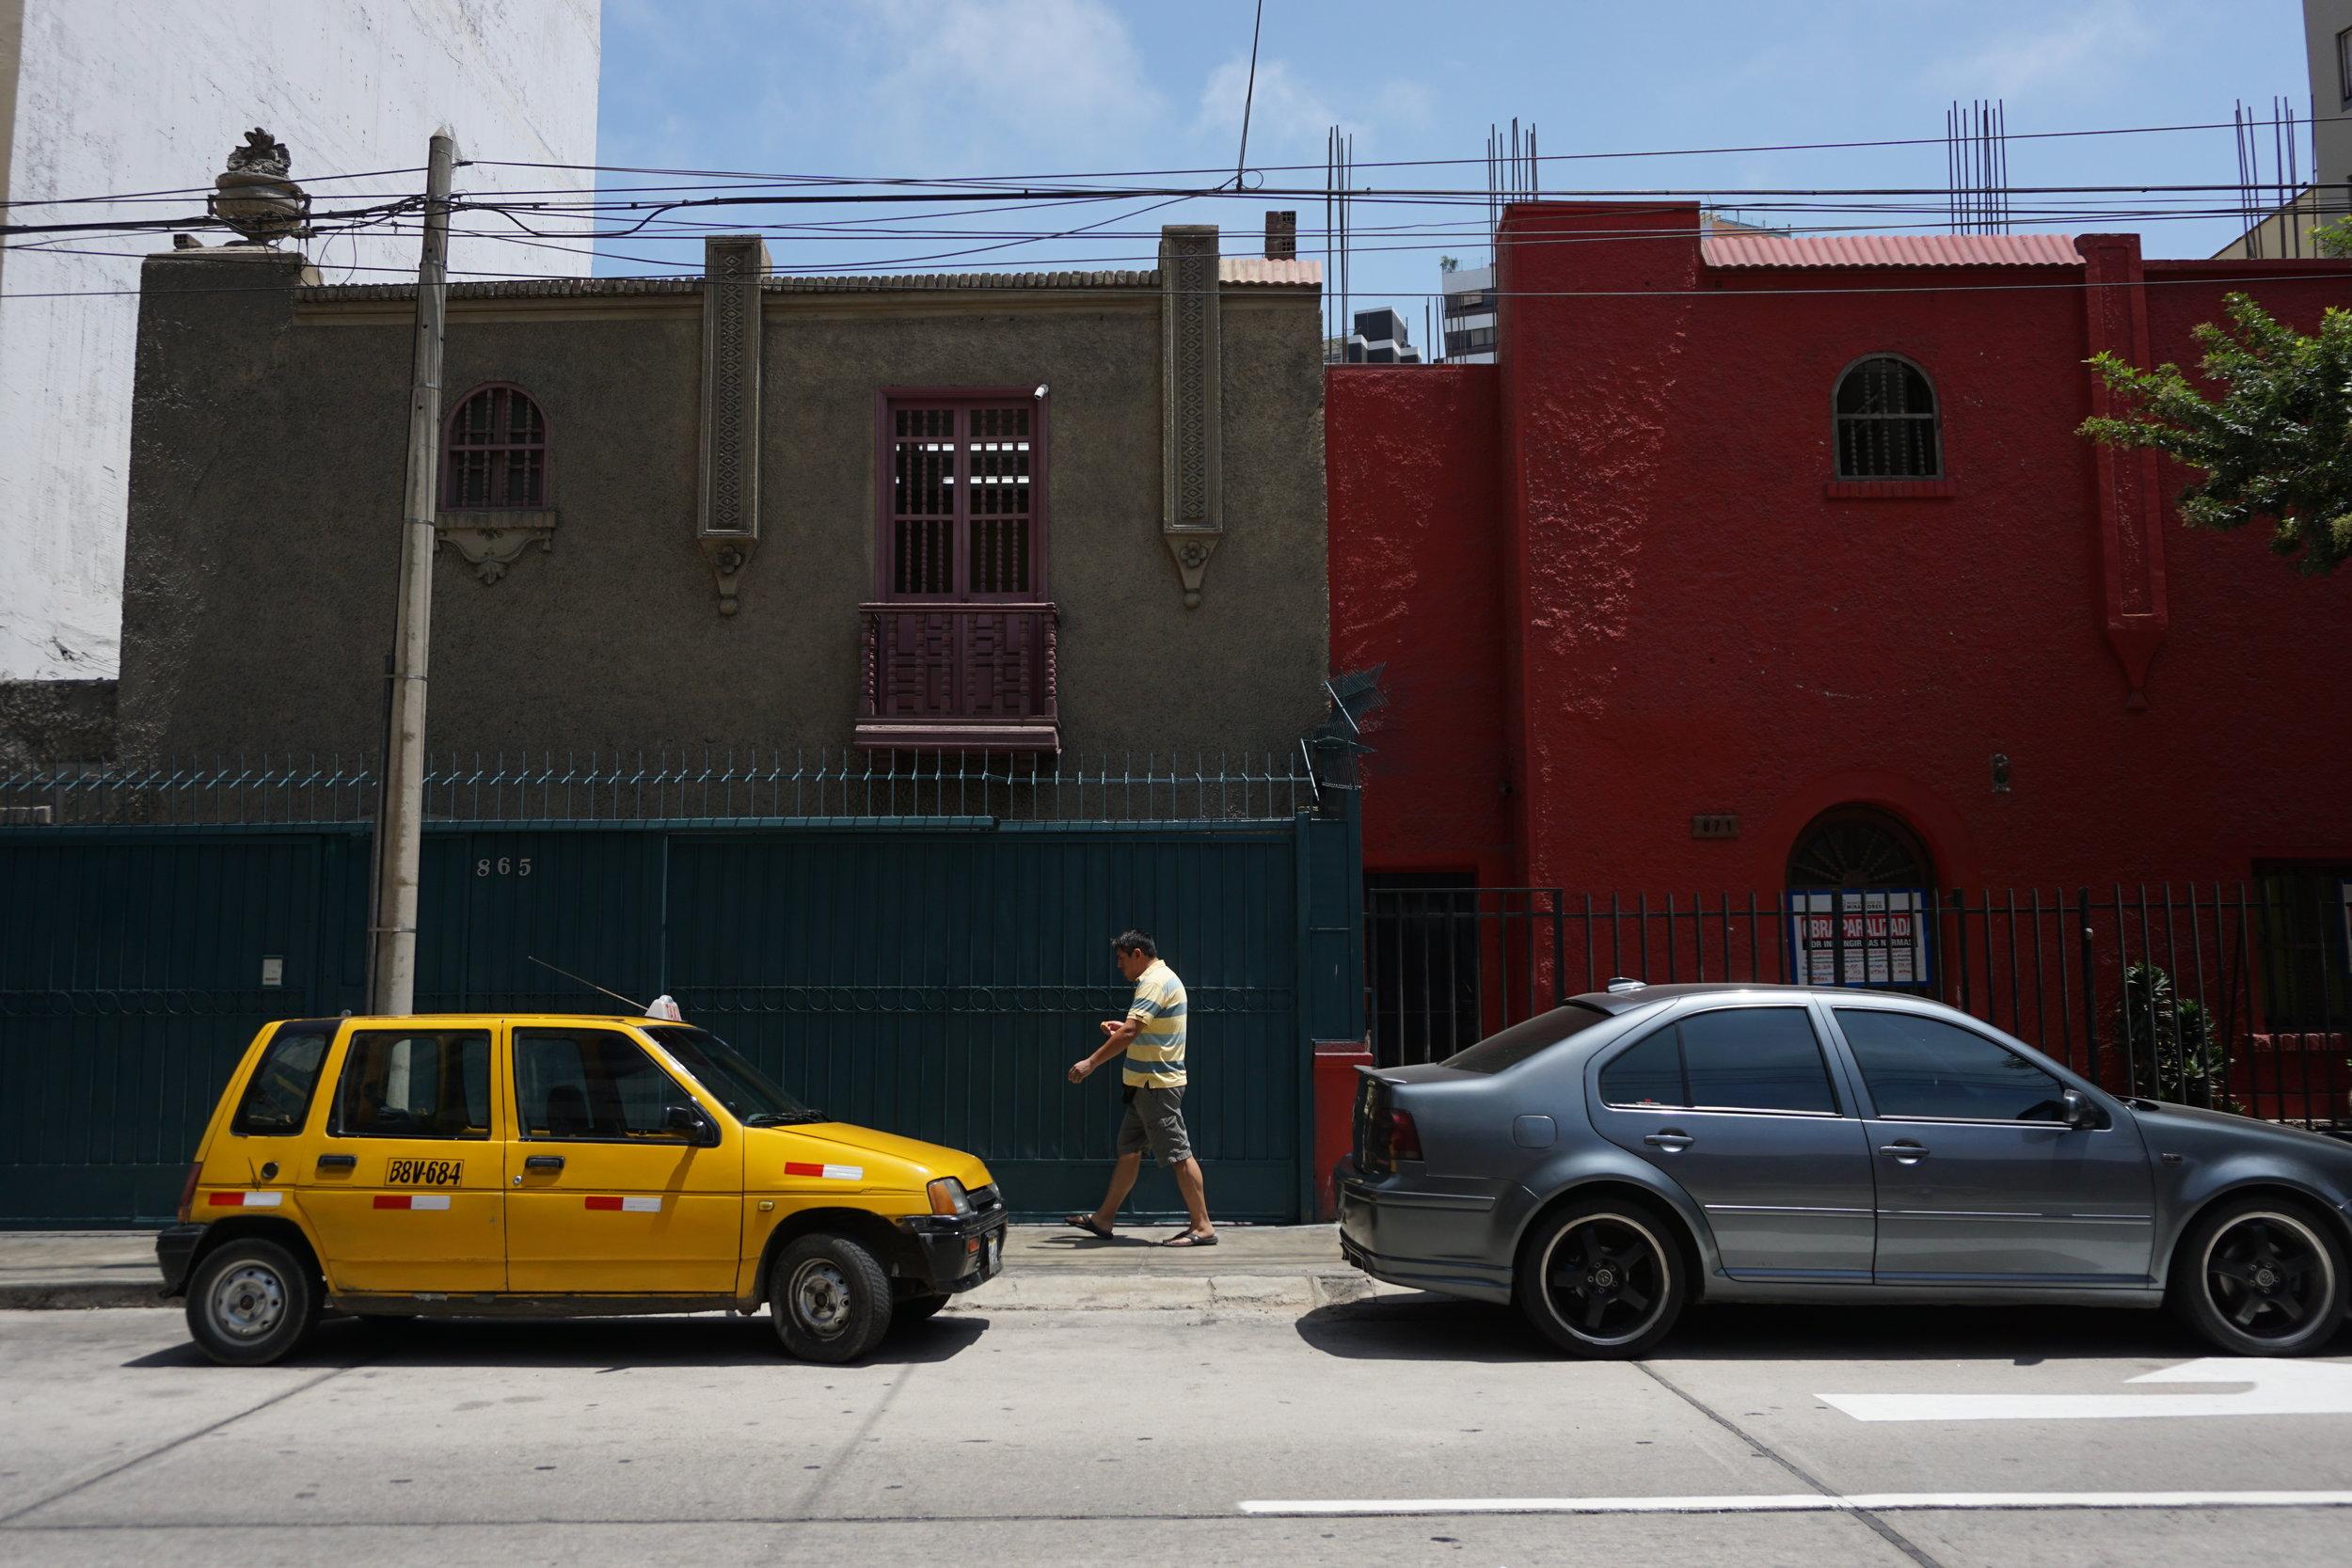 Streetscape, Miraflores district.